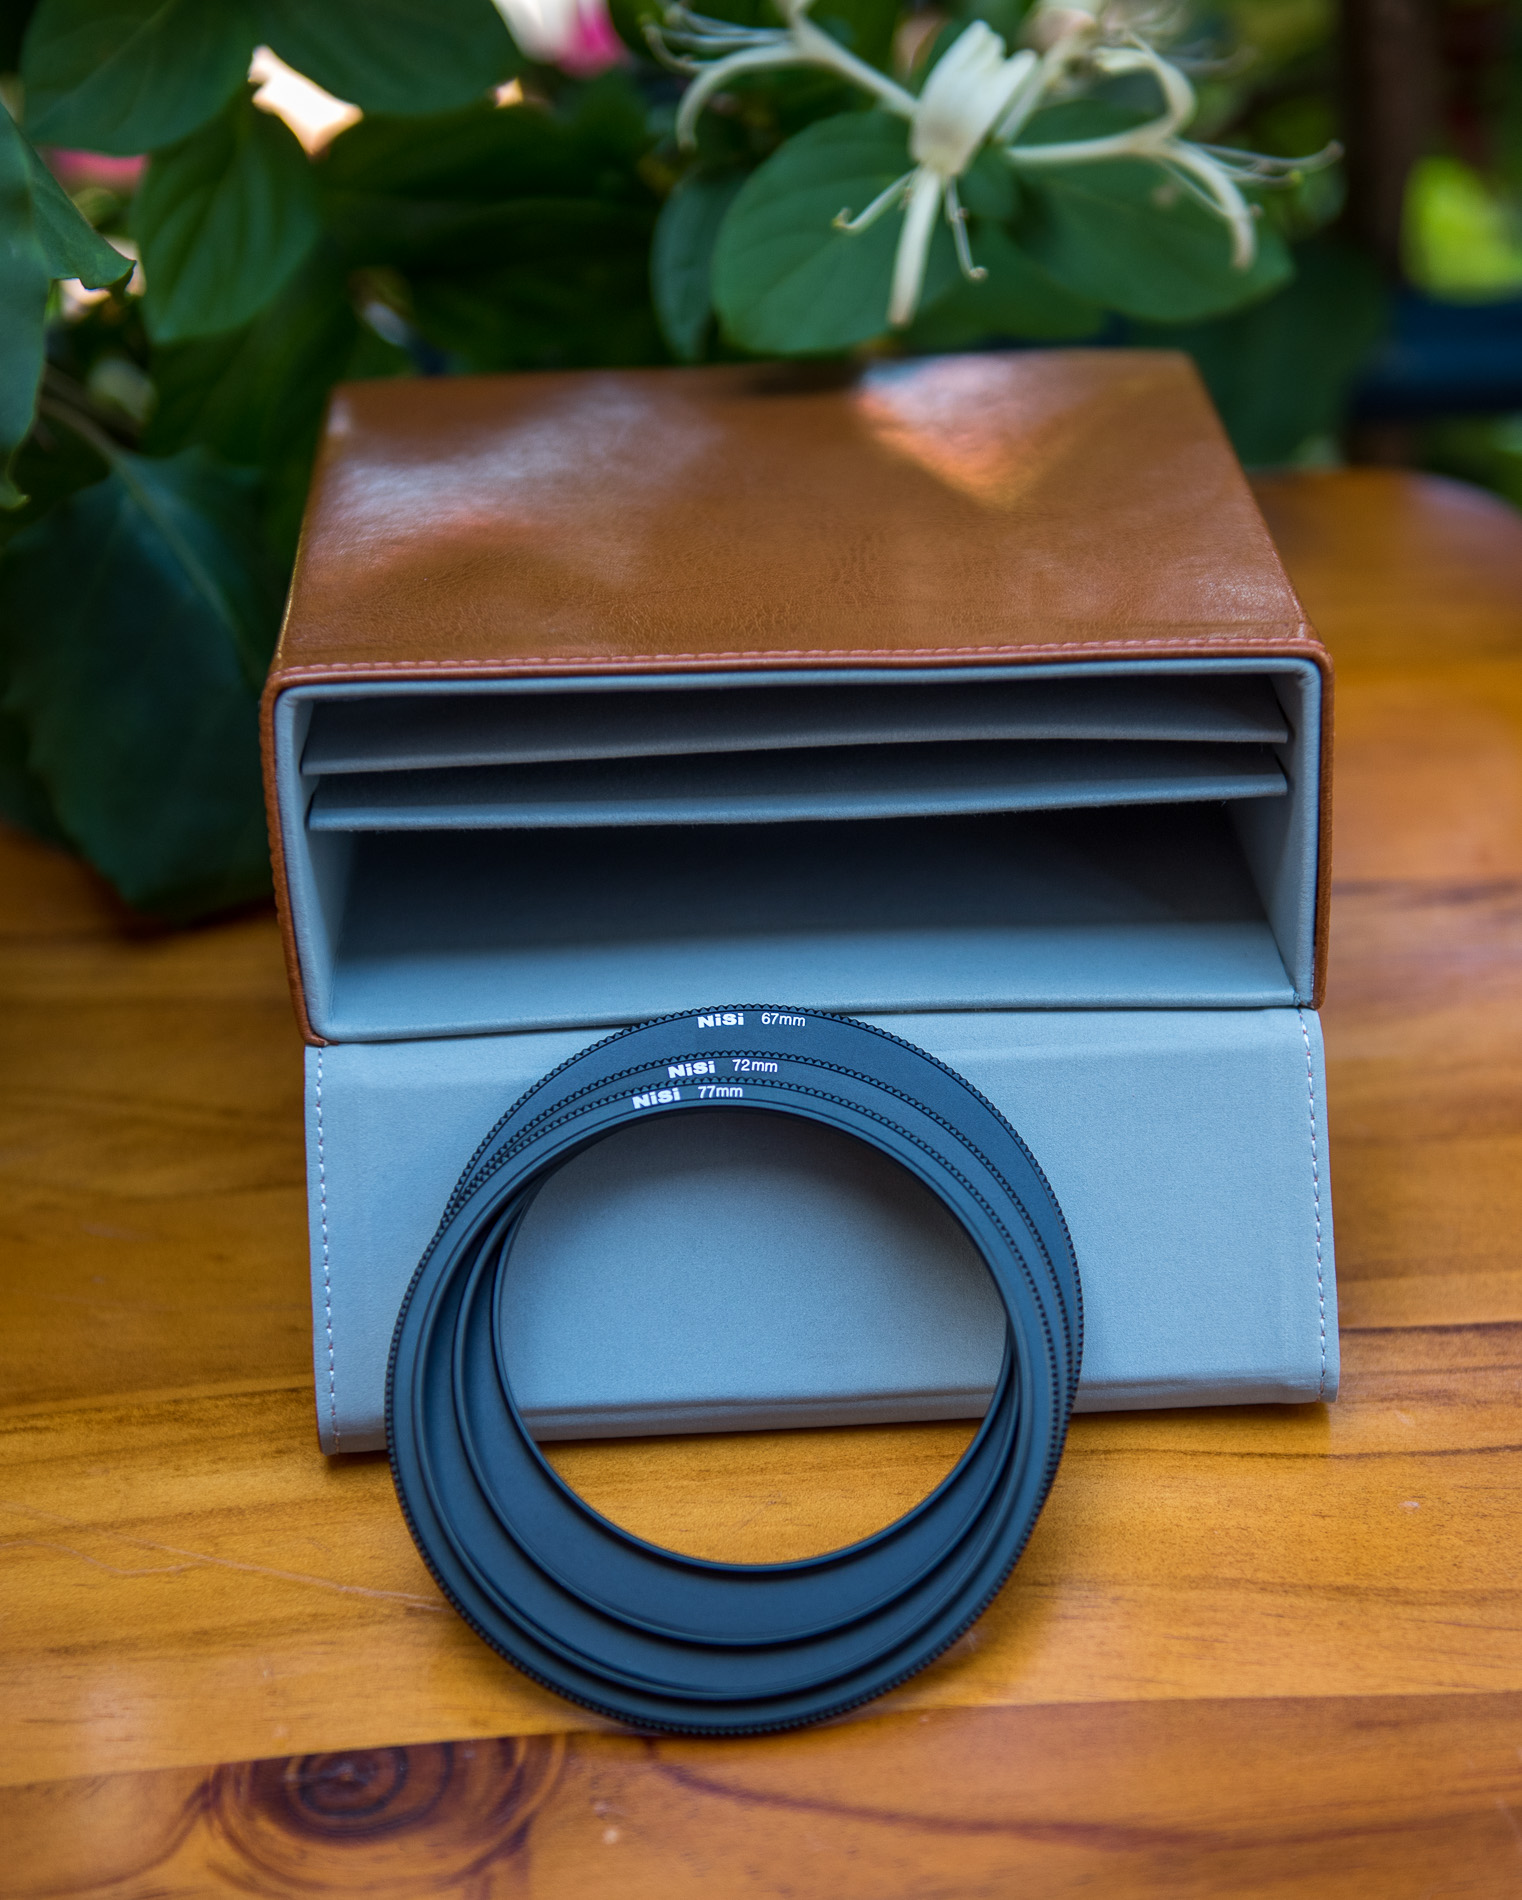 Lens adapter rings